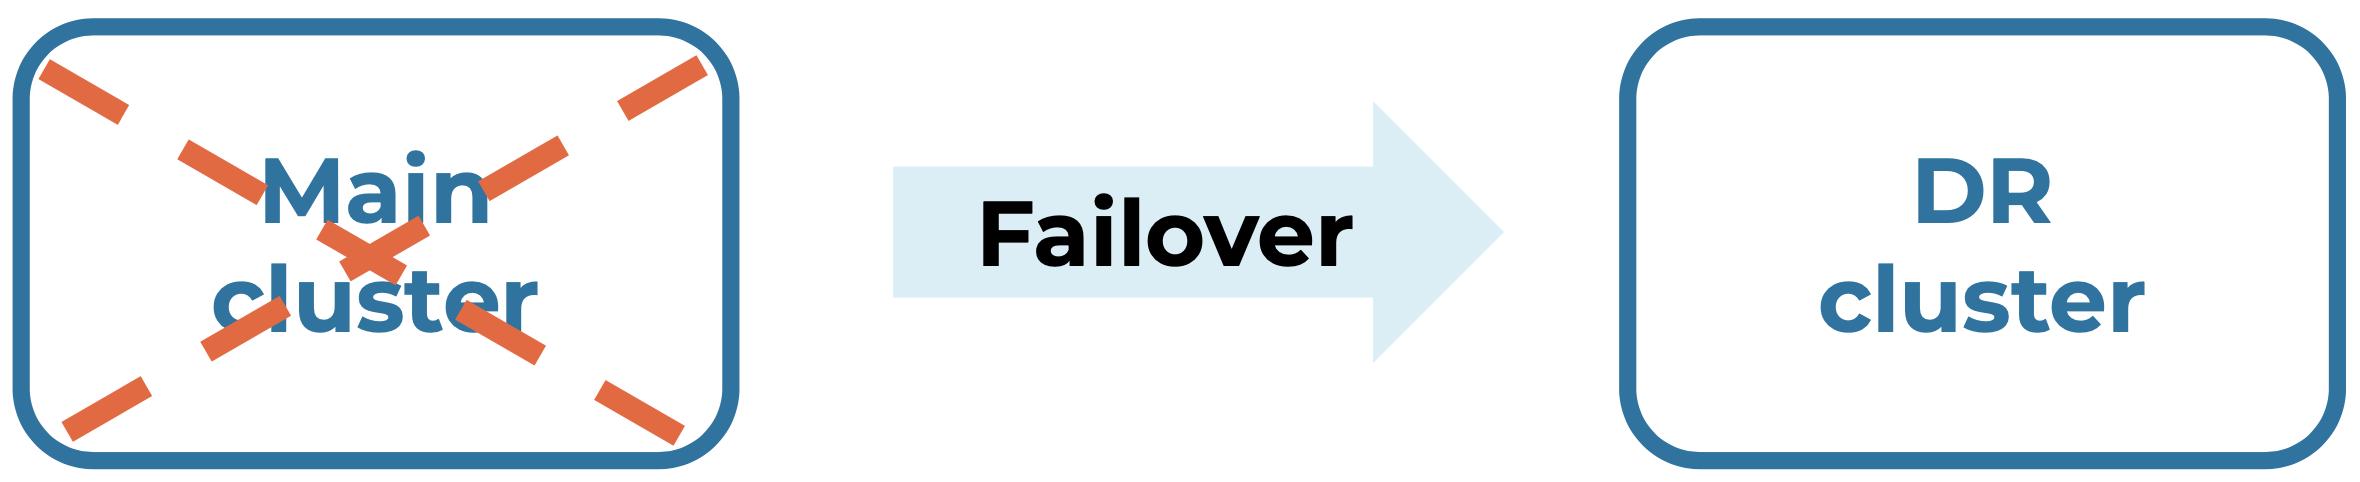 Failover command